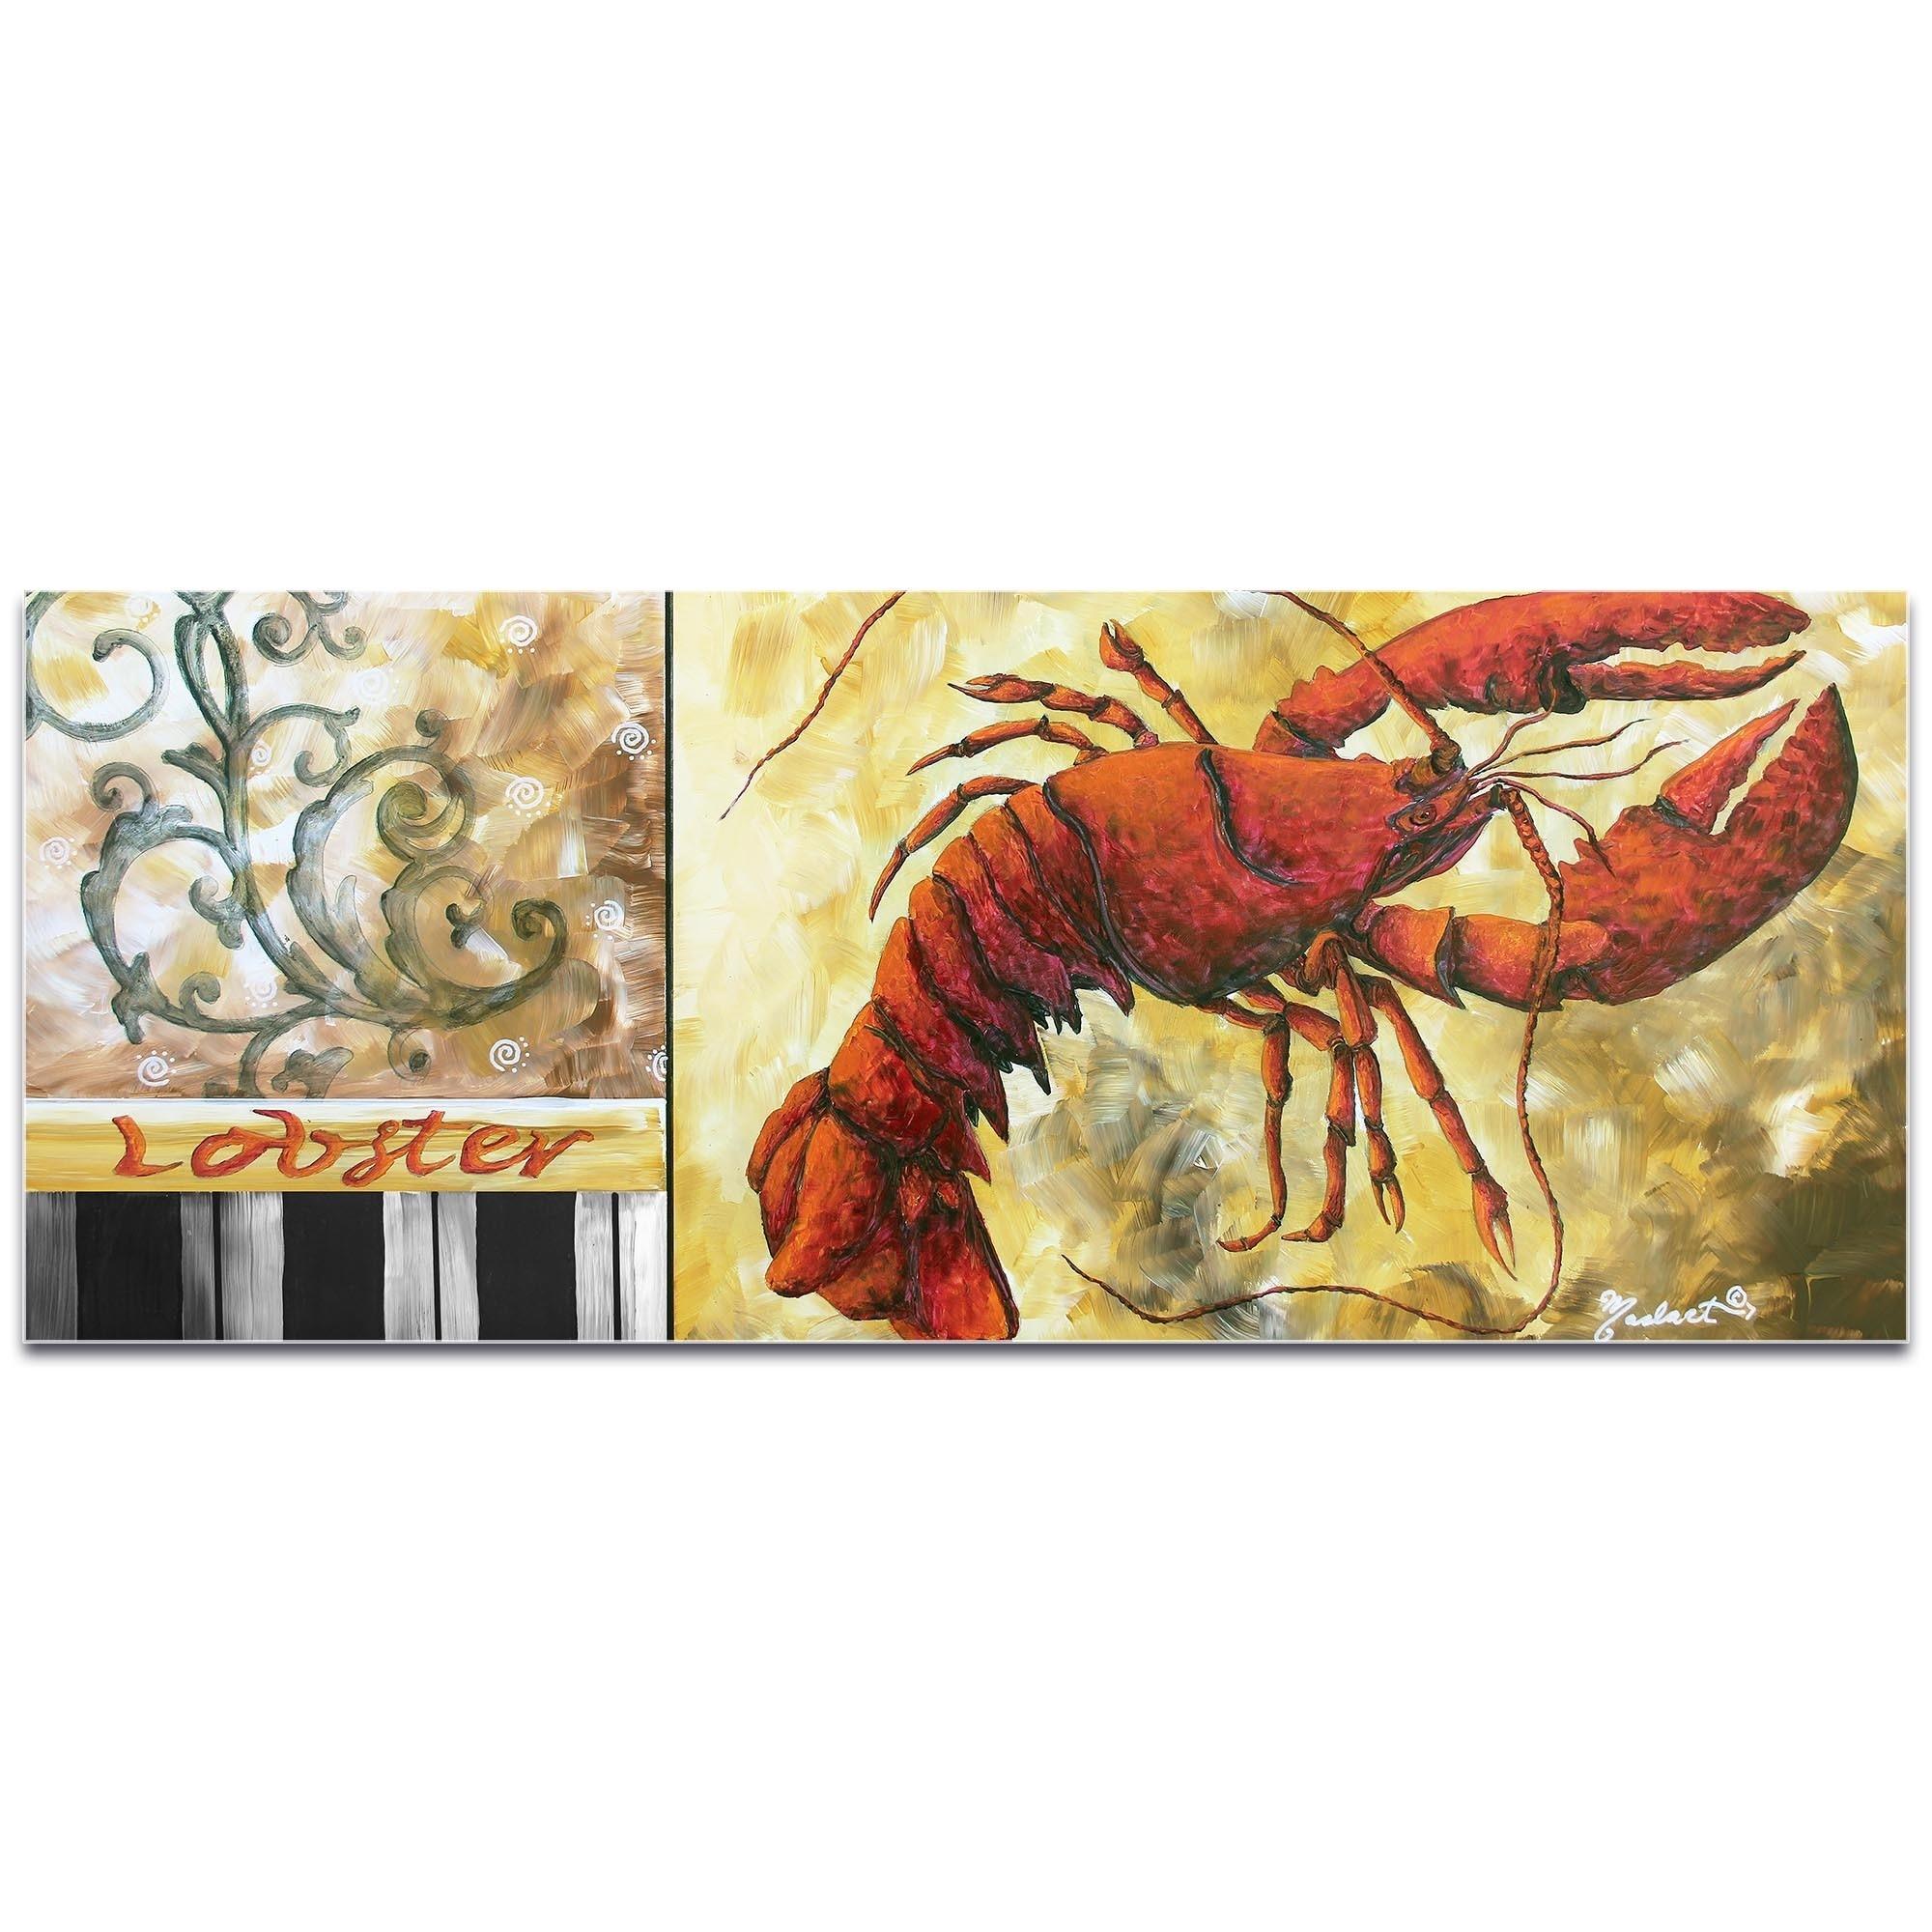 Megan Duncanson \'Lobster\' Coastal Decor on Metal or Acrylic   eBay